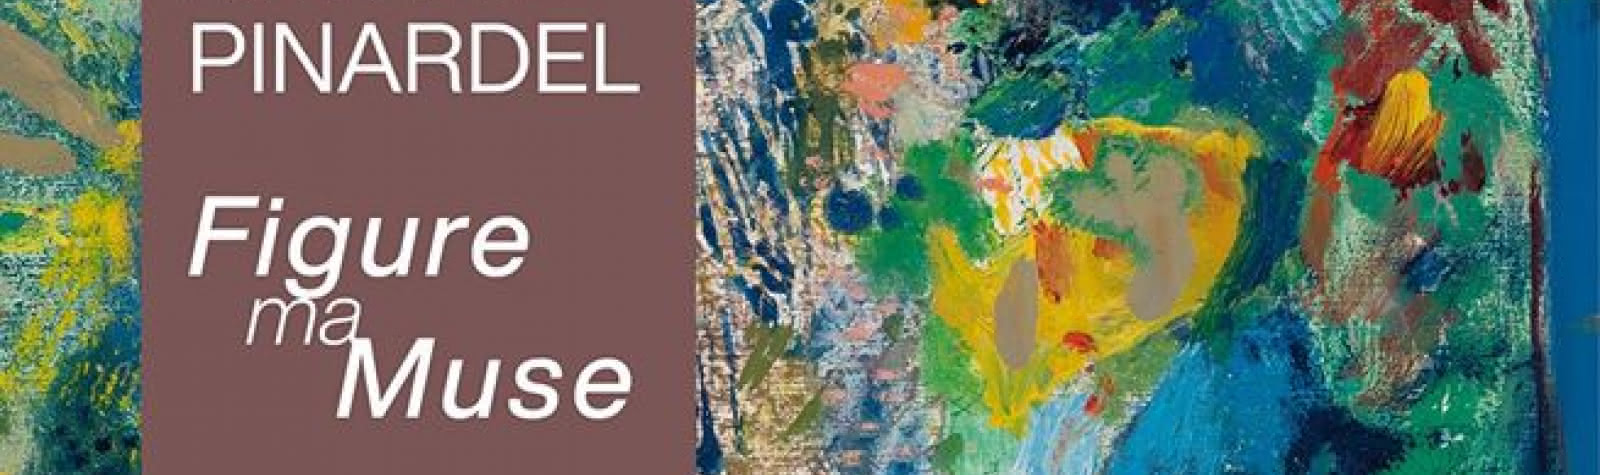 Exposition : Figure ma Muse de Marie-Claire Pinardel